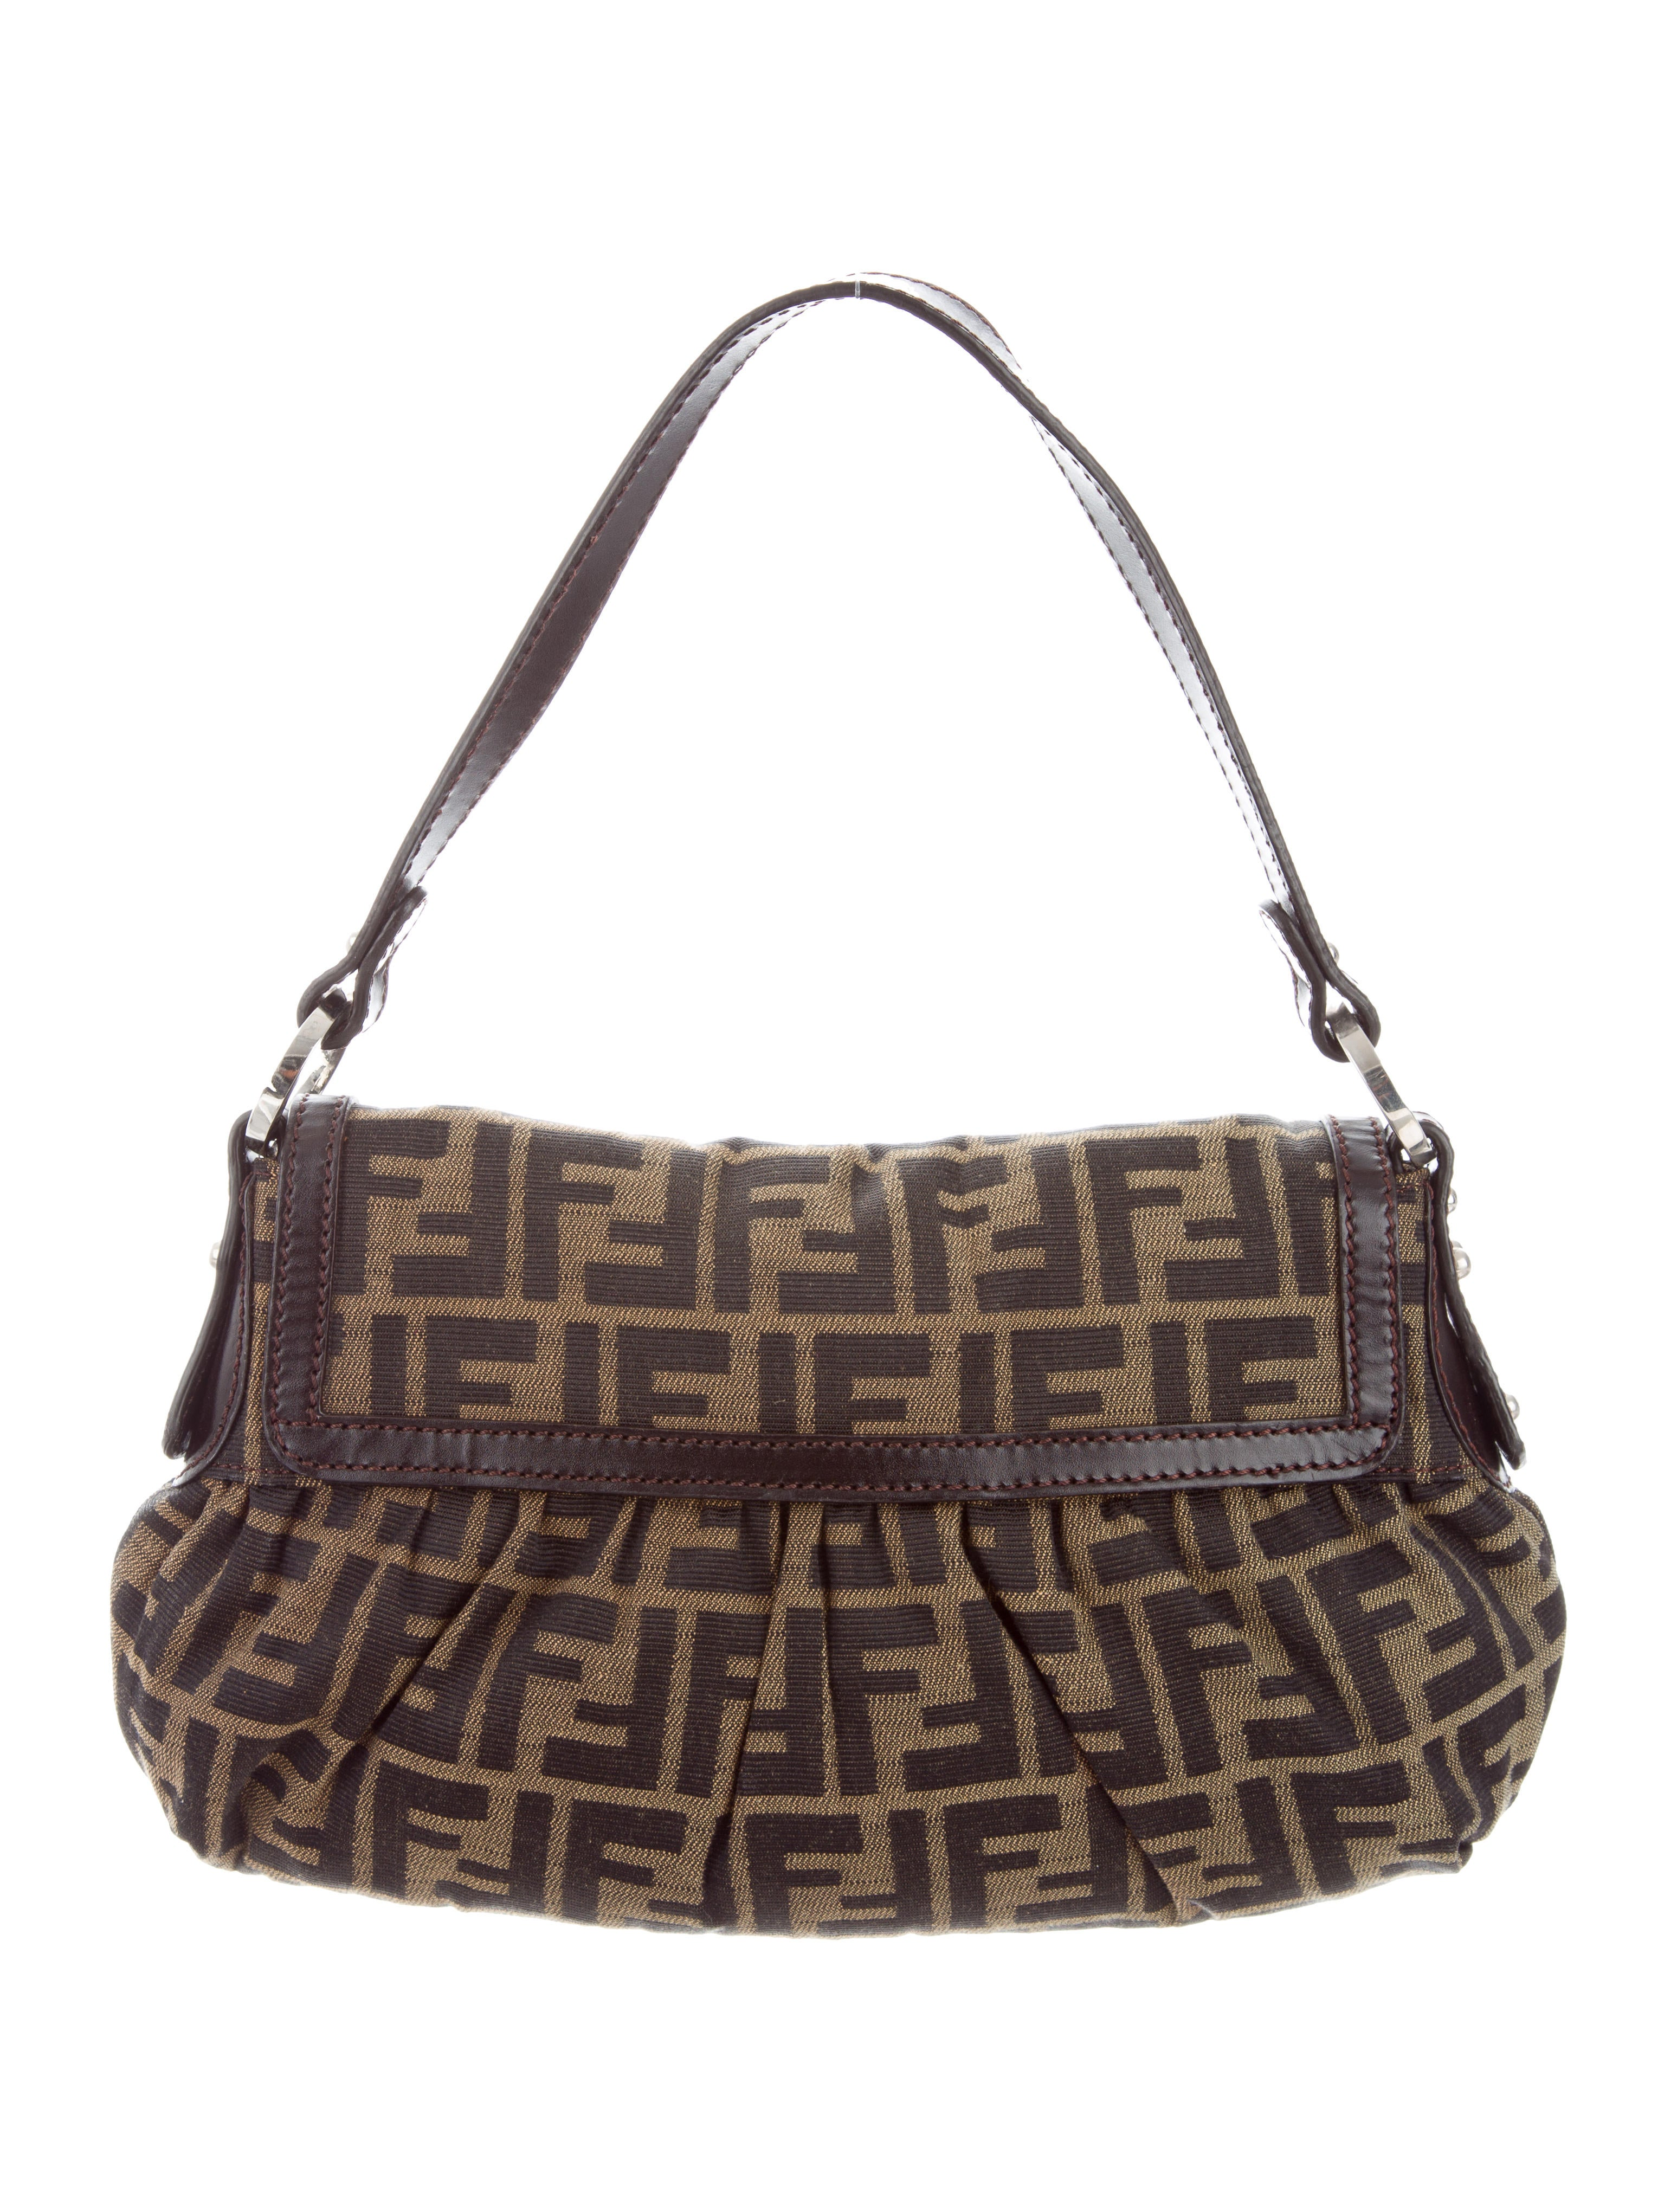 Fendi Women's Handbags & Purses | Nordstrom